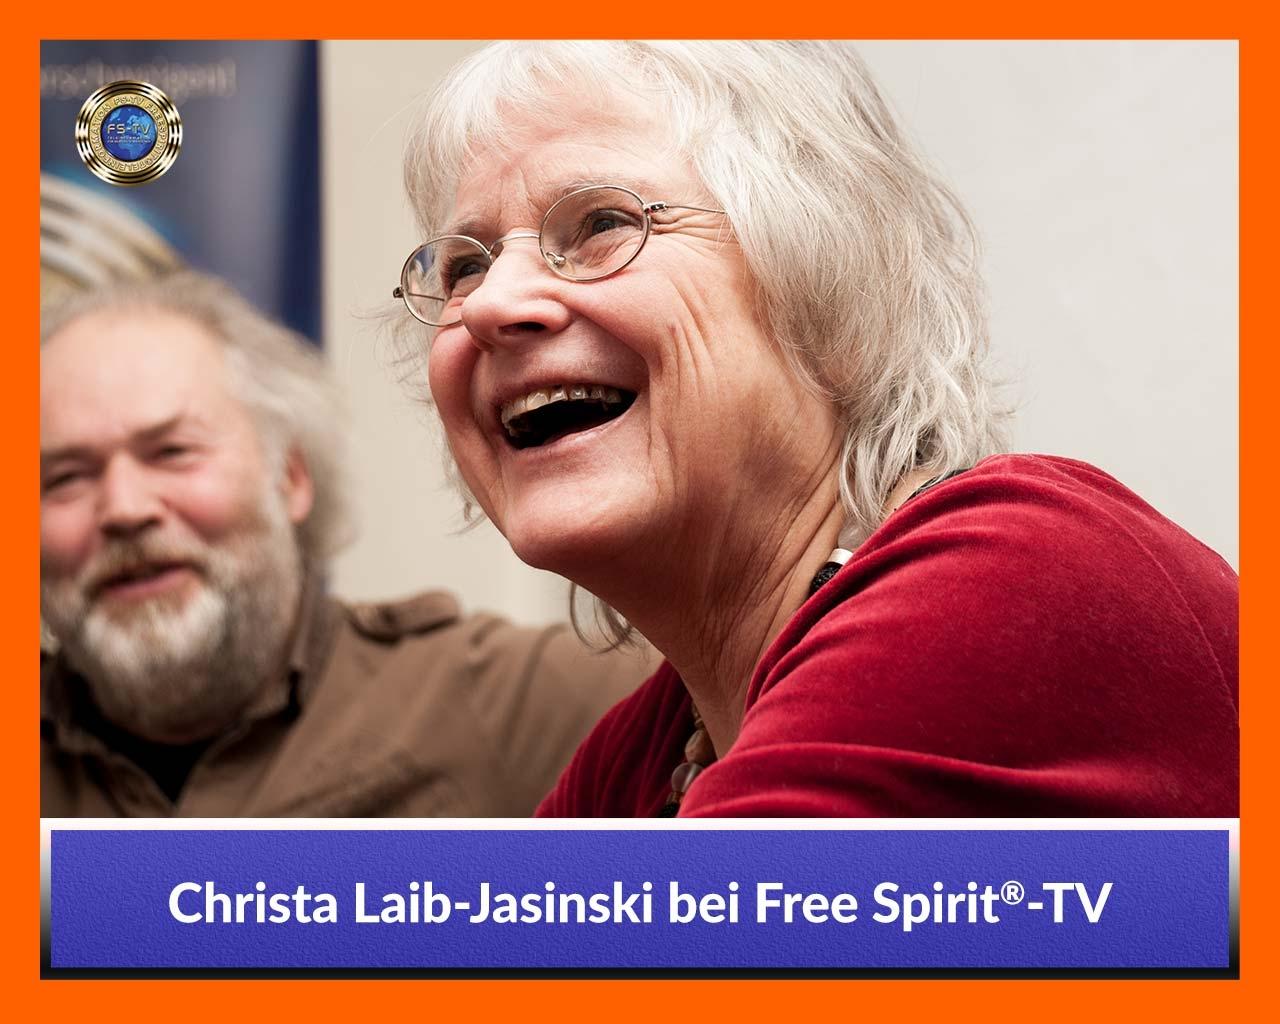 Christa-Laib-Jasinski-05